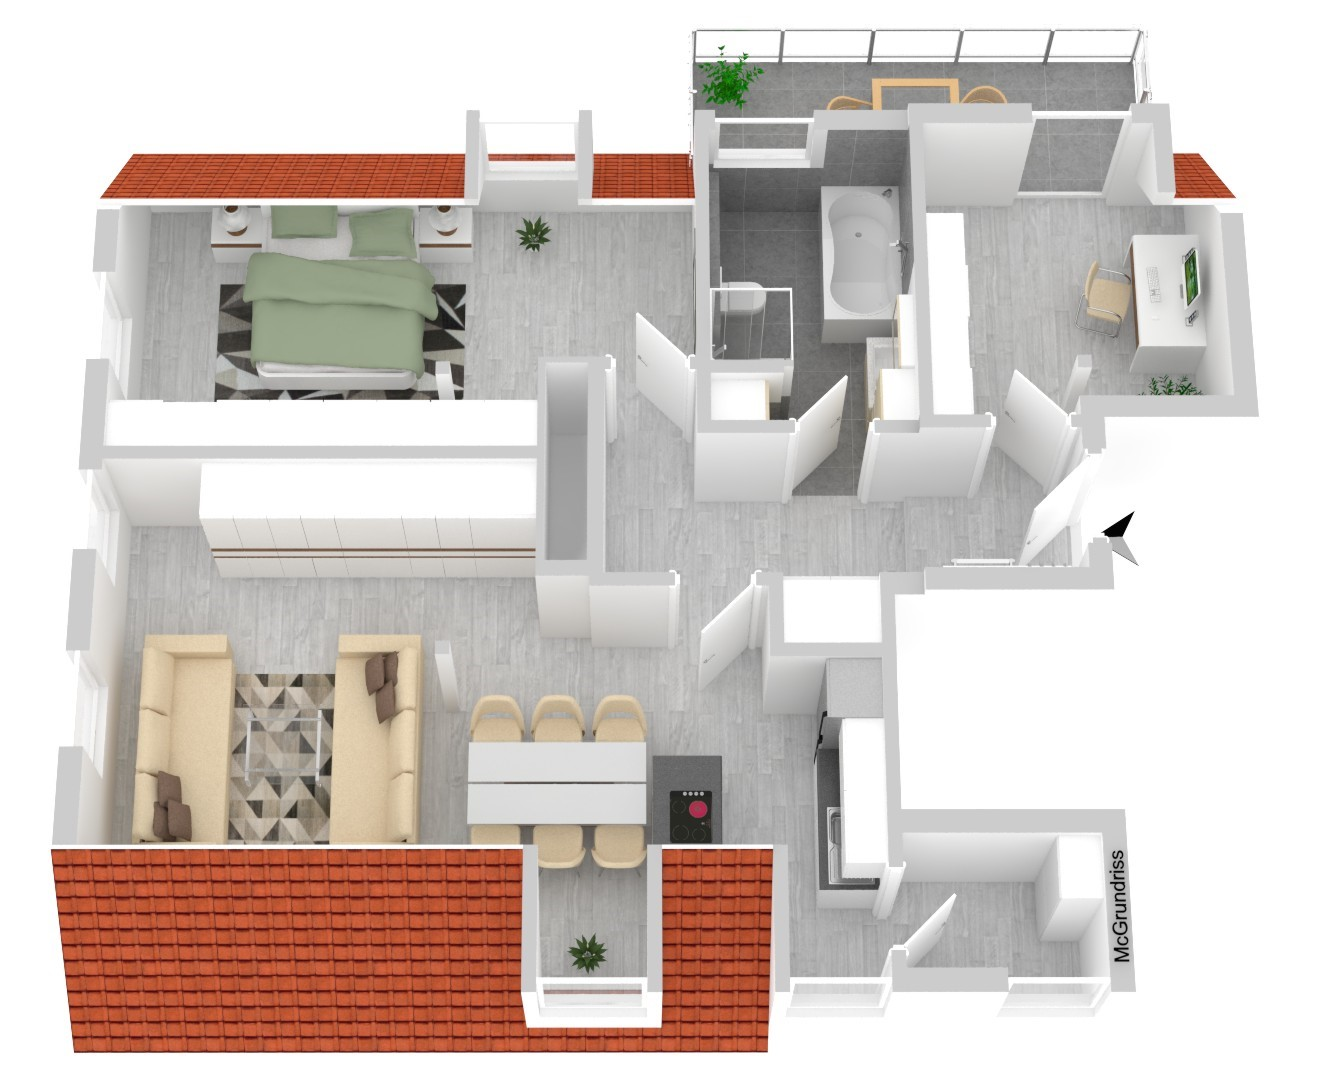 Wohnung Nr. 6 (92,99 m²)